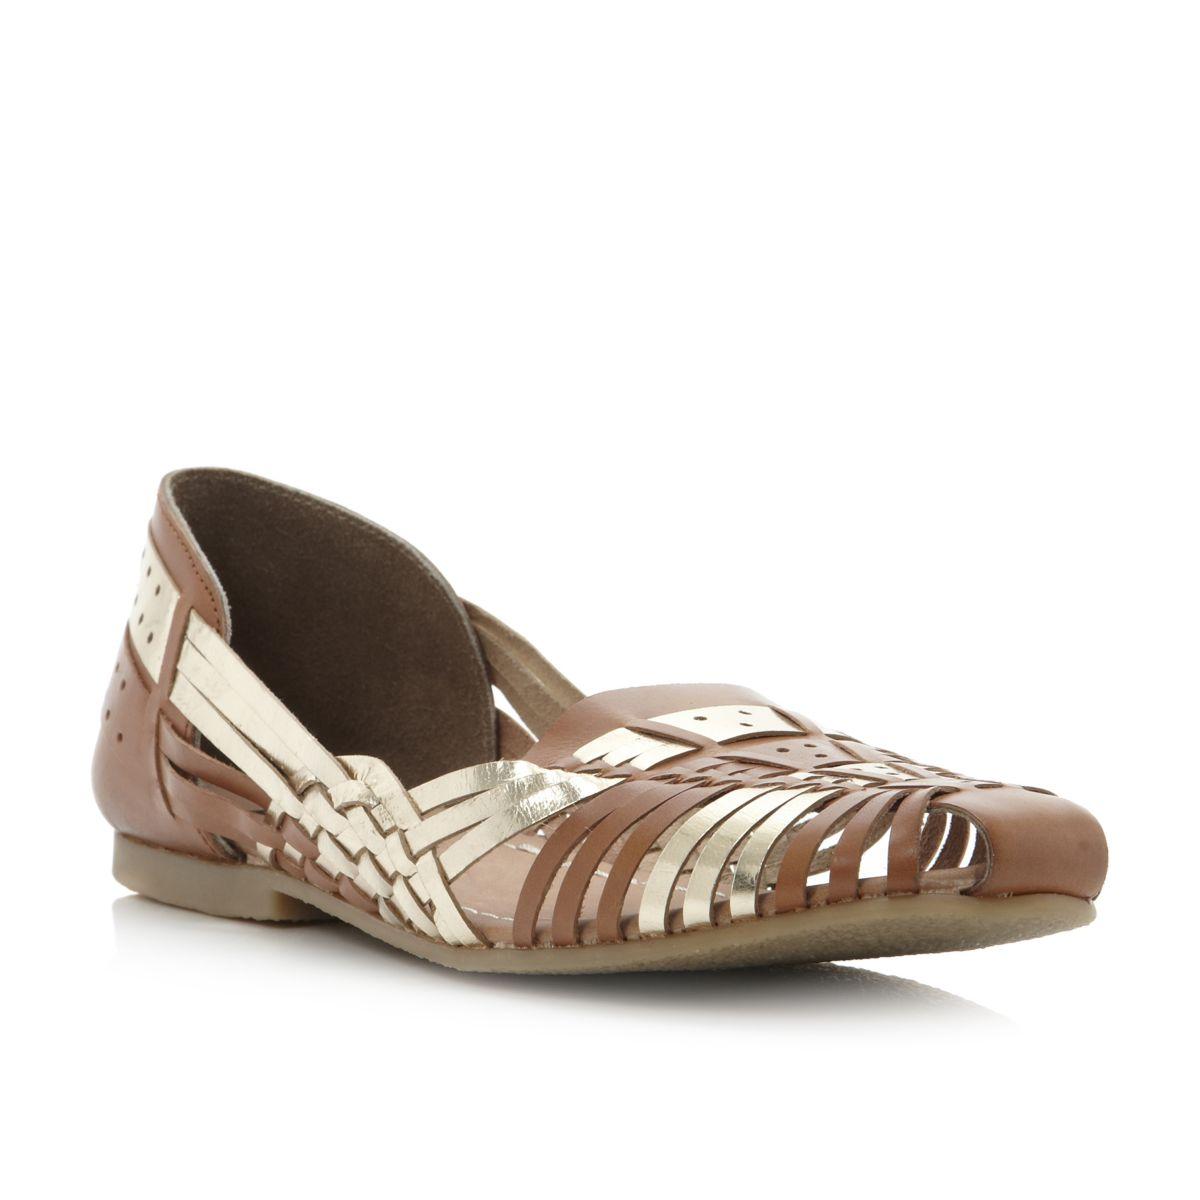 Bertie Flat Shoes